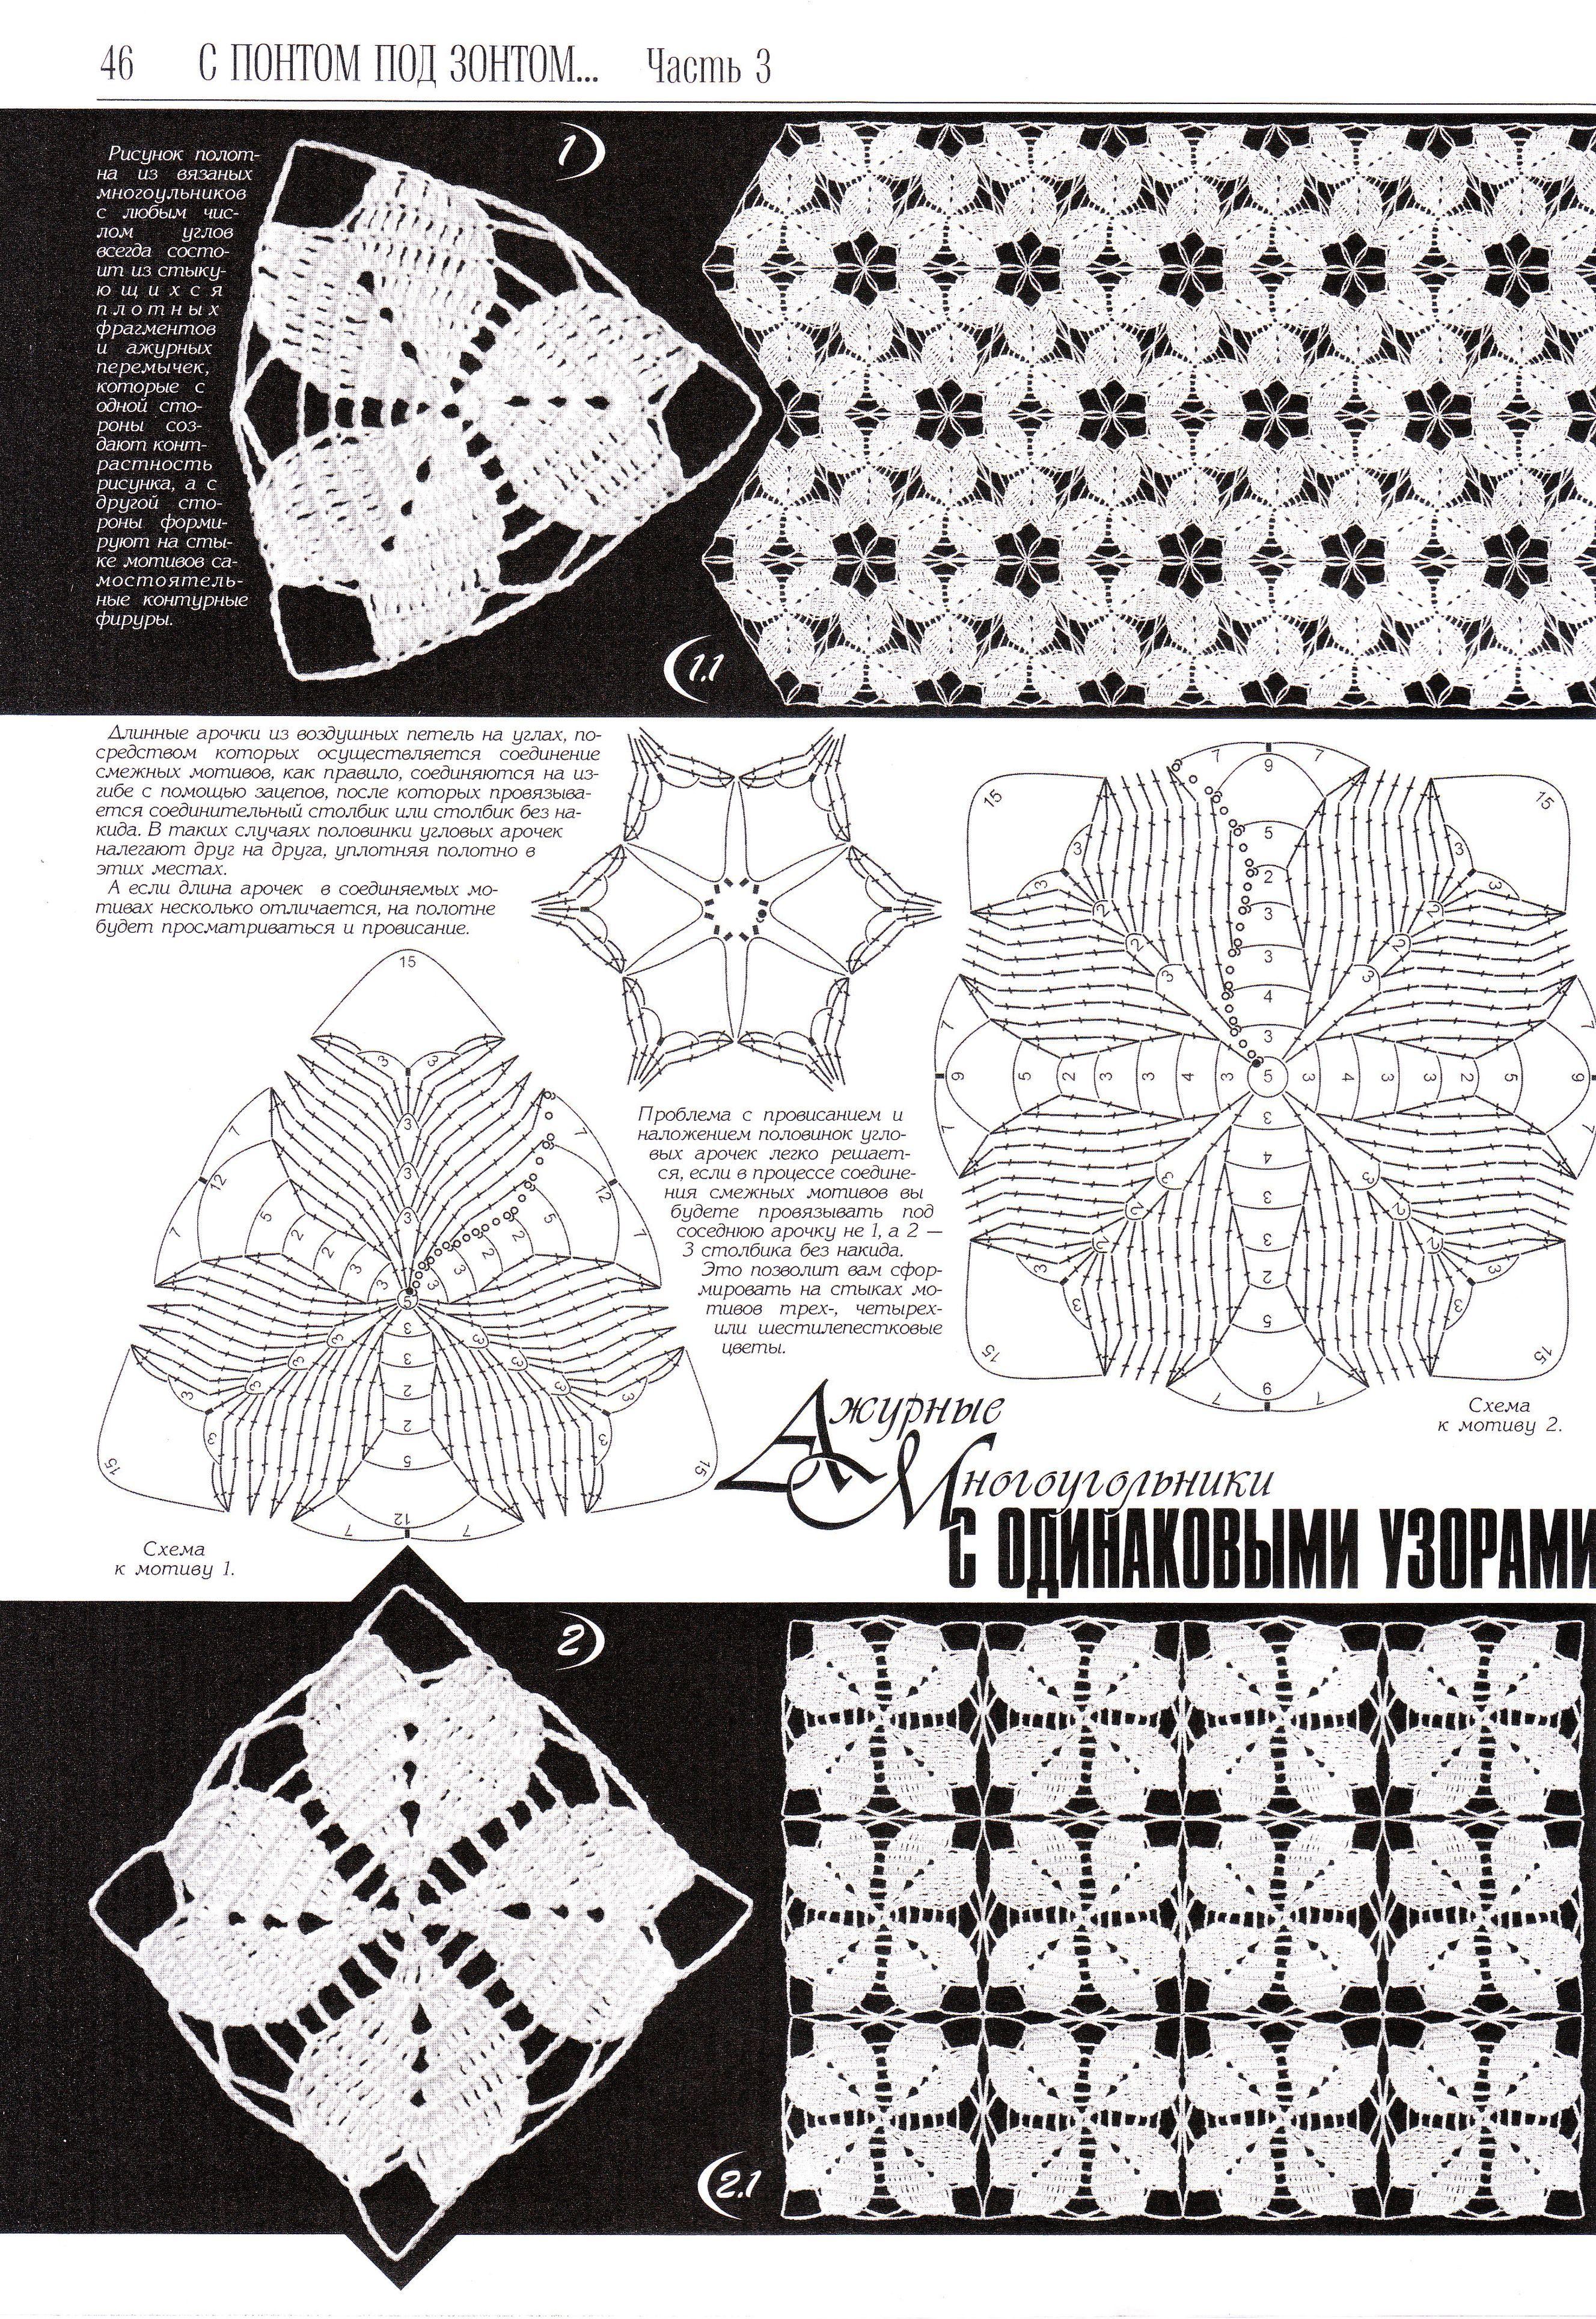 imgbox - fast, simple image host | Crochet 24b cuadrados | Pinterest ...